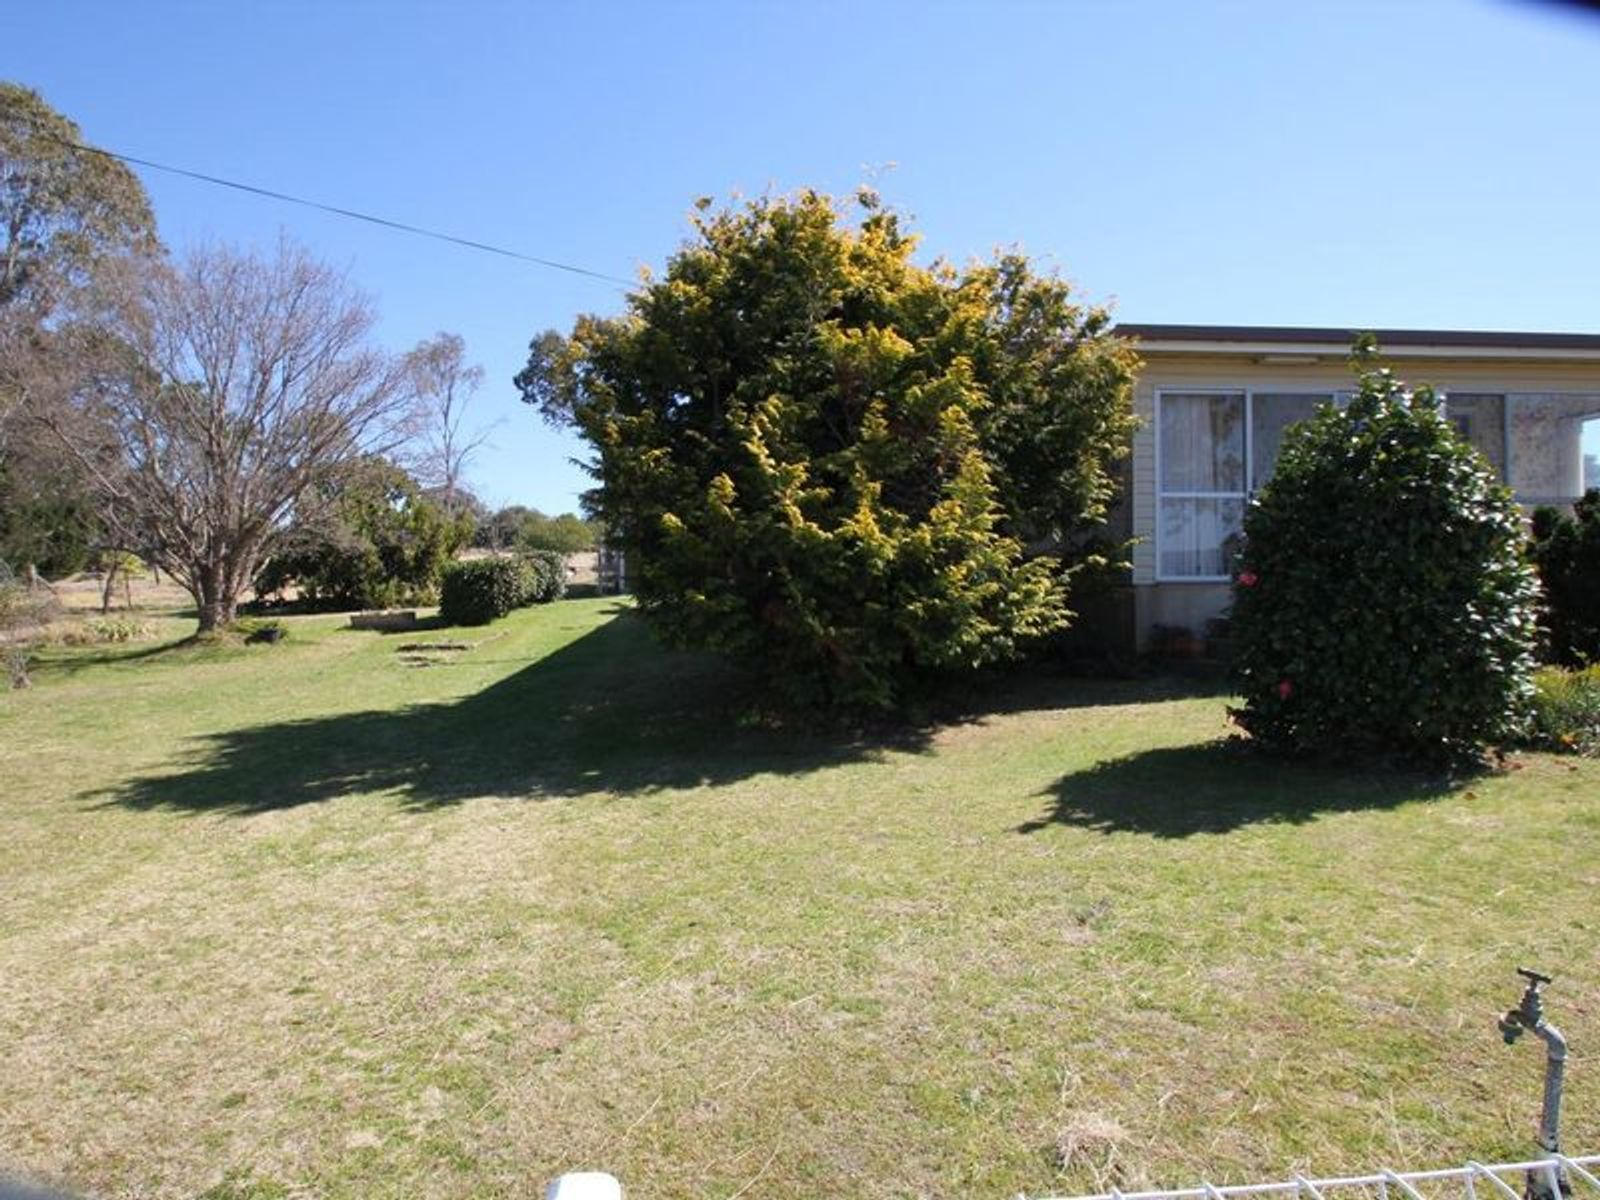 15 Phelhampton Crescent, Jennings, NSW 4383